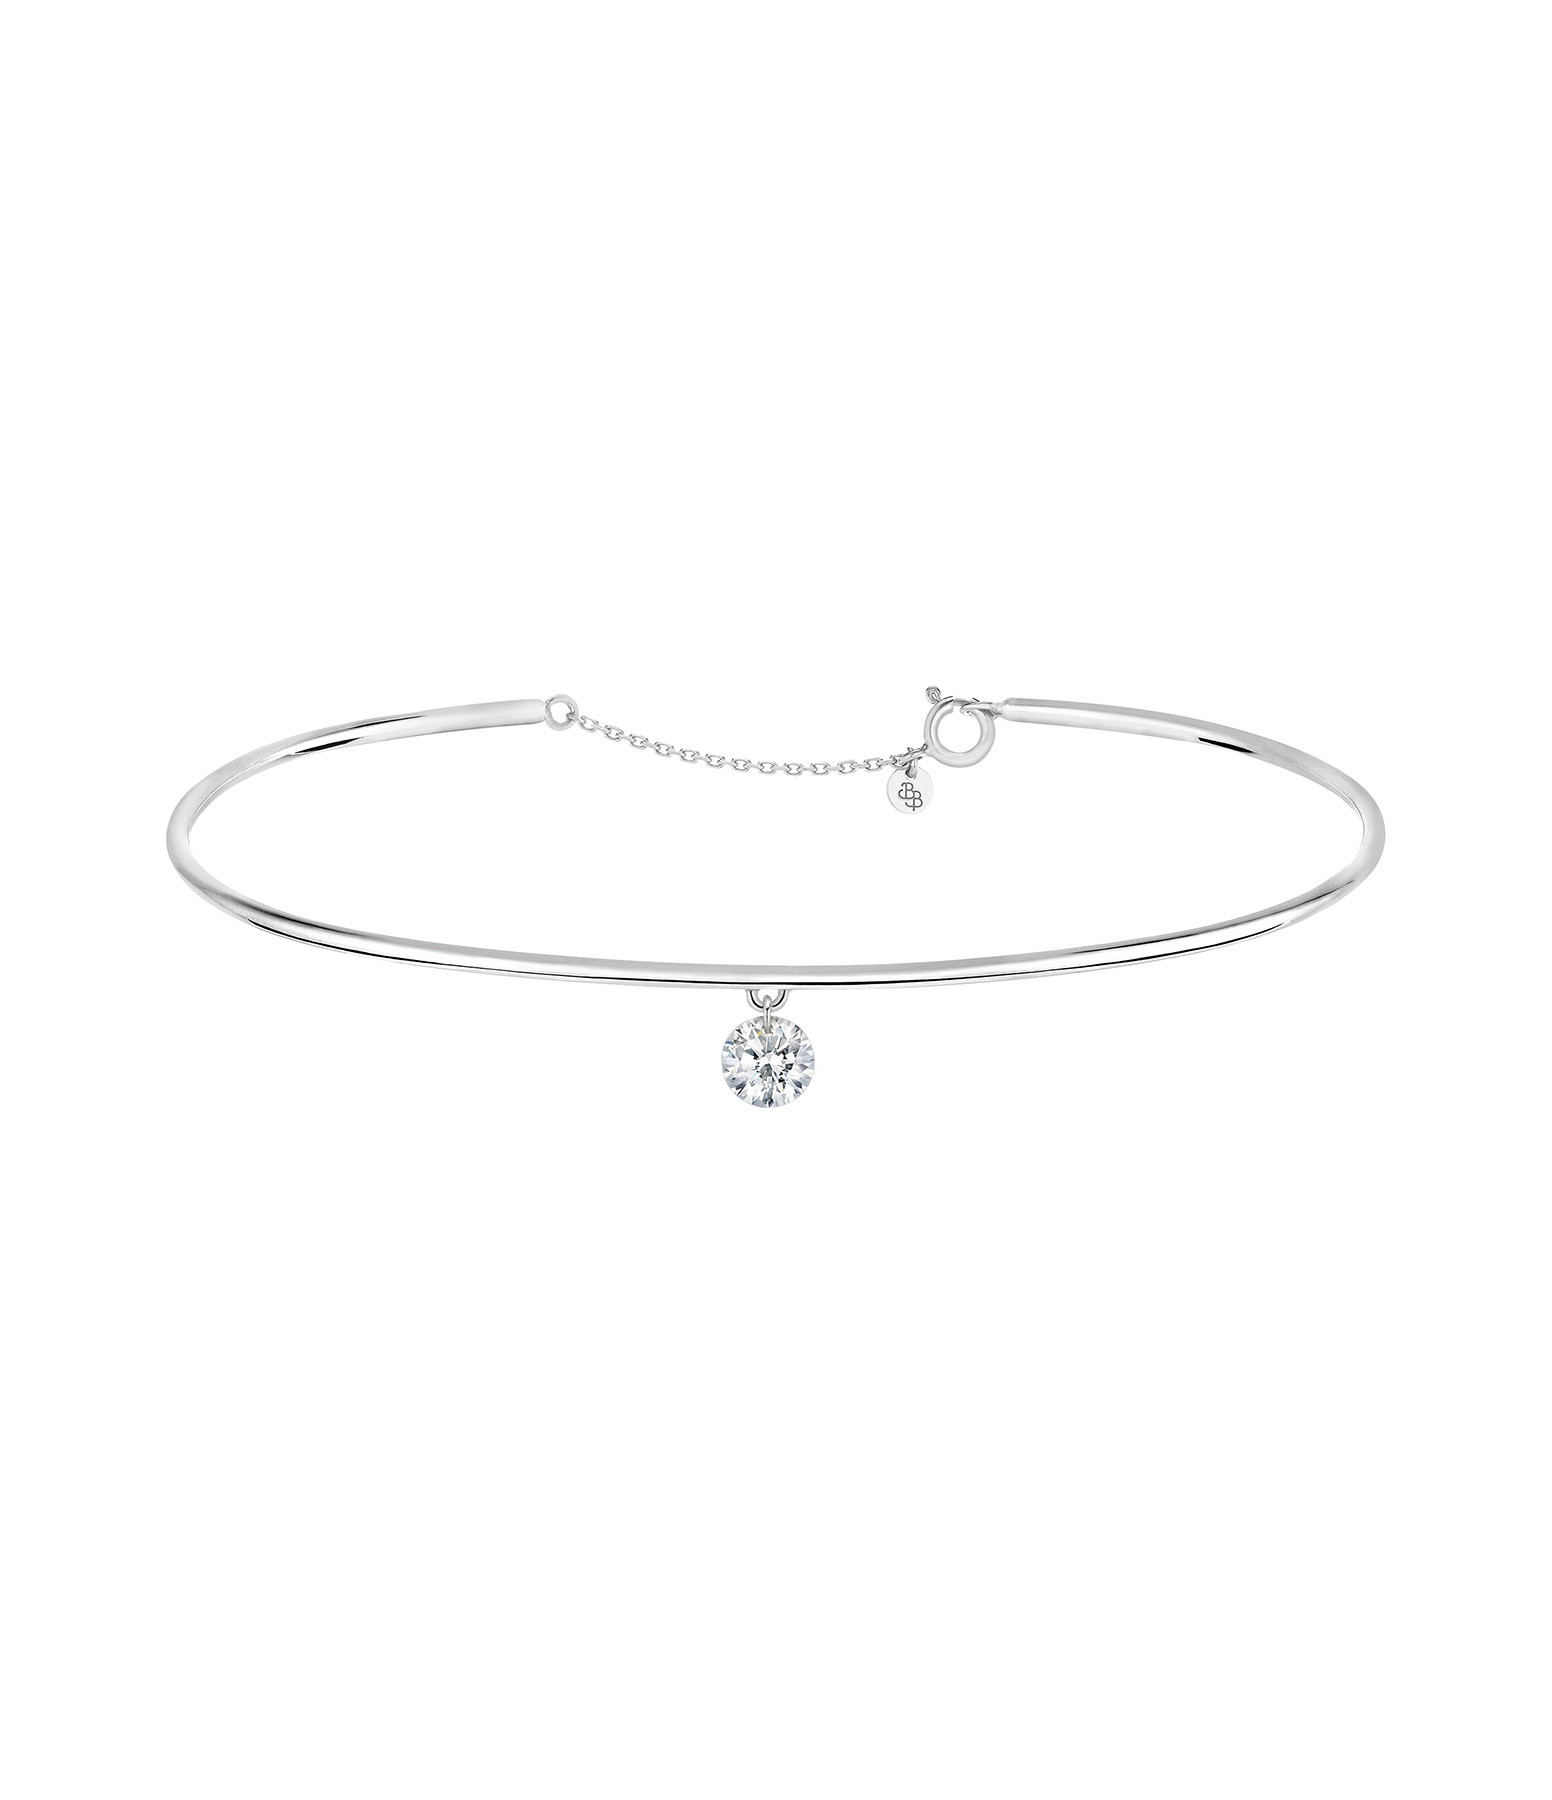 LA BRUNE & LA BLONDE - Jonc 360° Diamant Brillant 0,07 Or Blanc